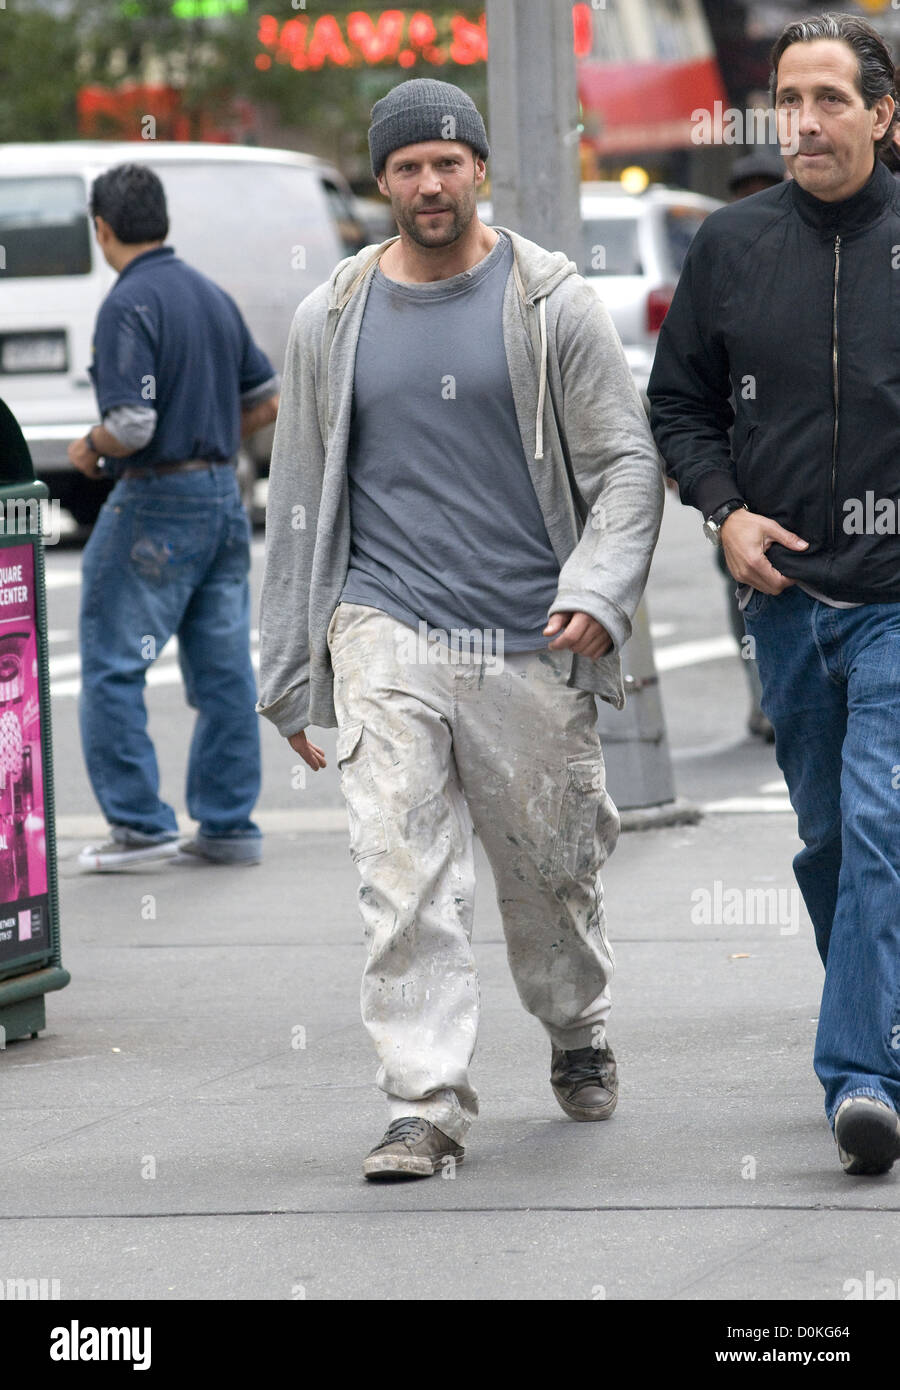 Jason Statham filming 'Safe' on location in Manhattan New York City, USA - 06.10.10 Stock Photo